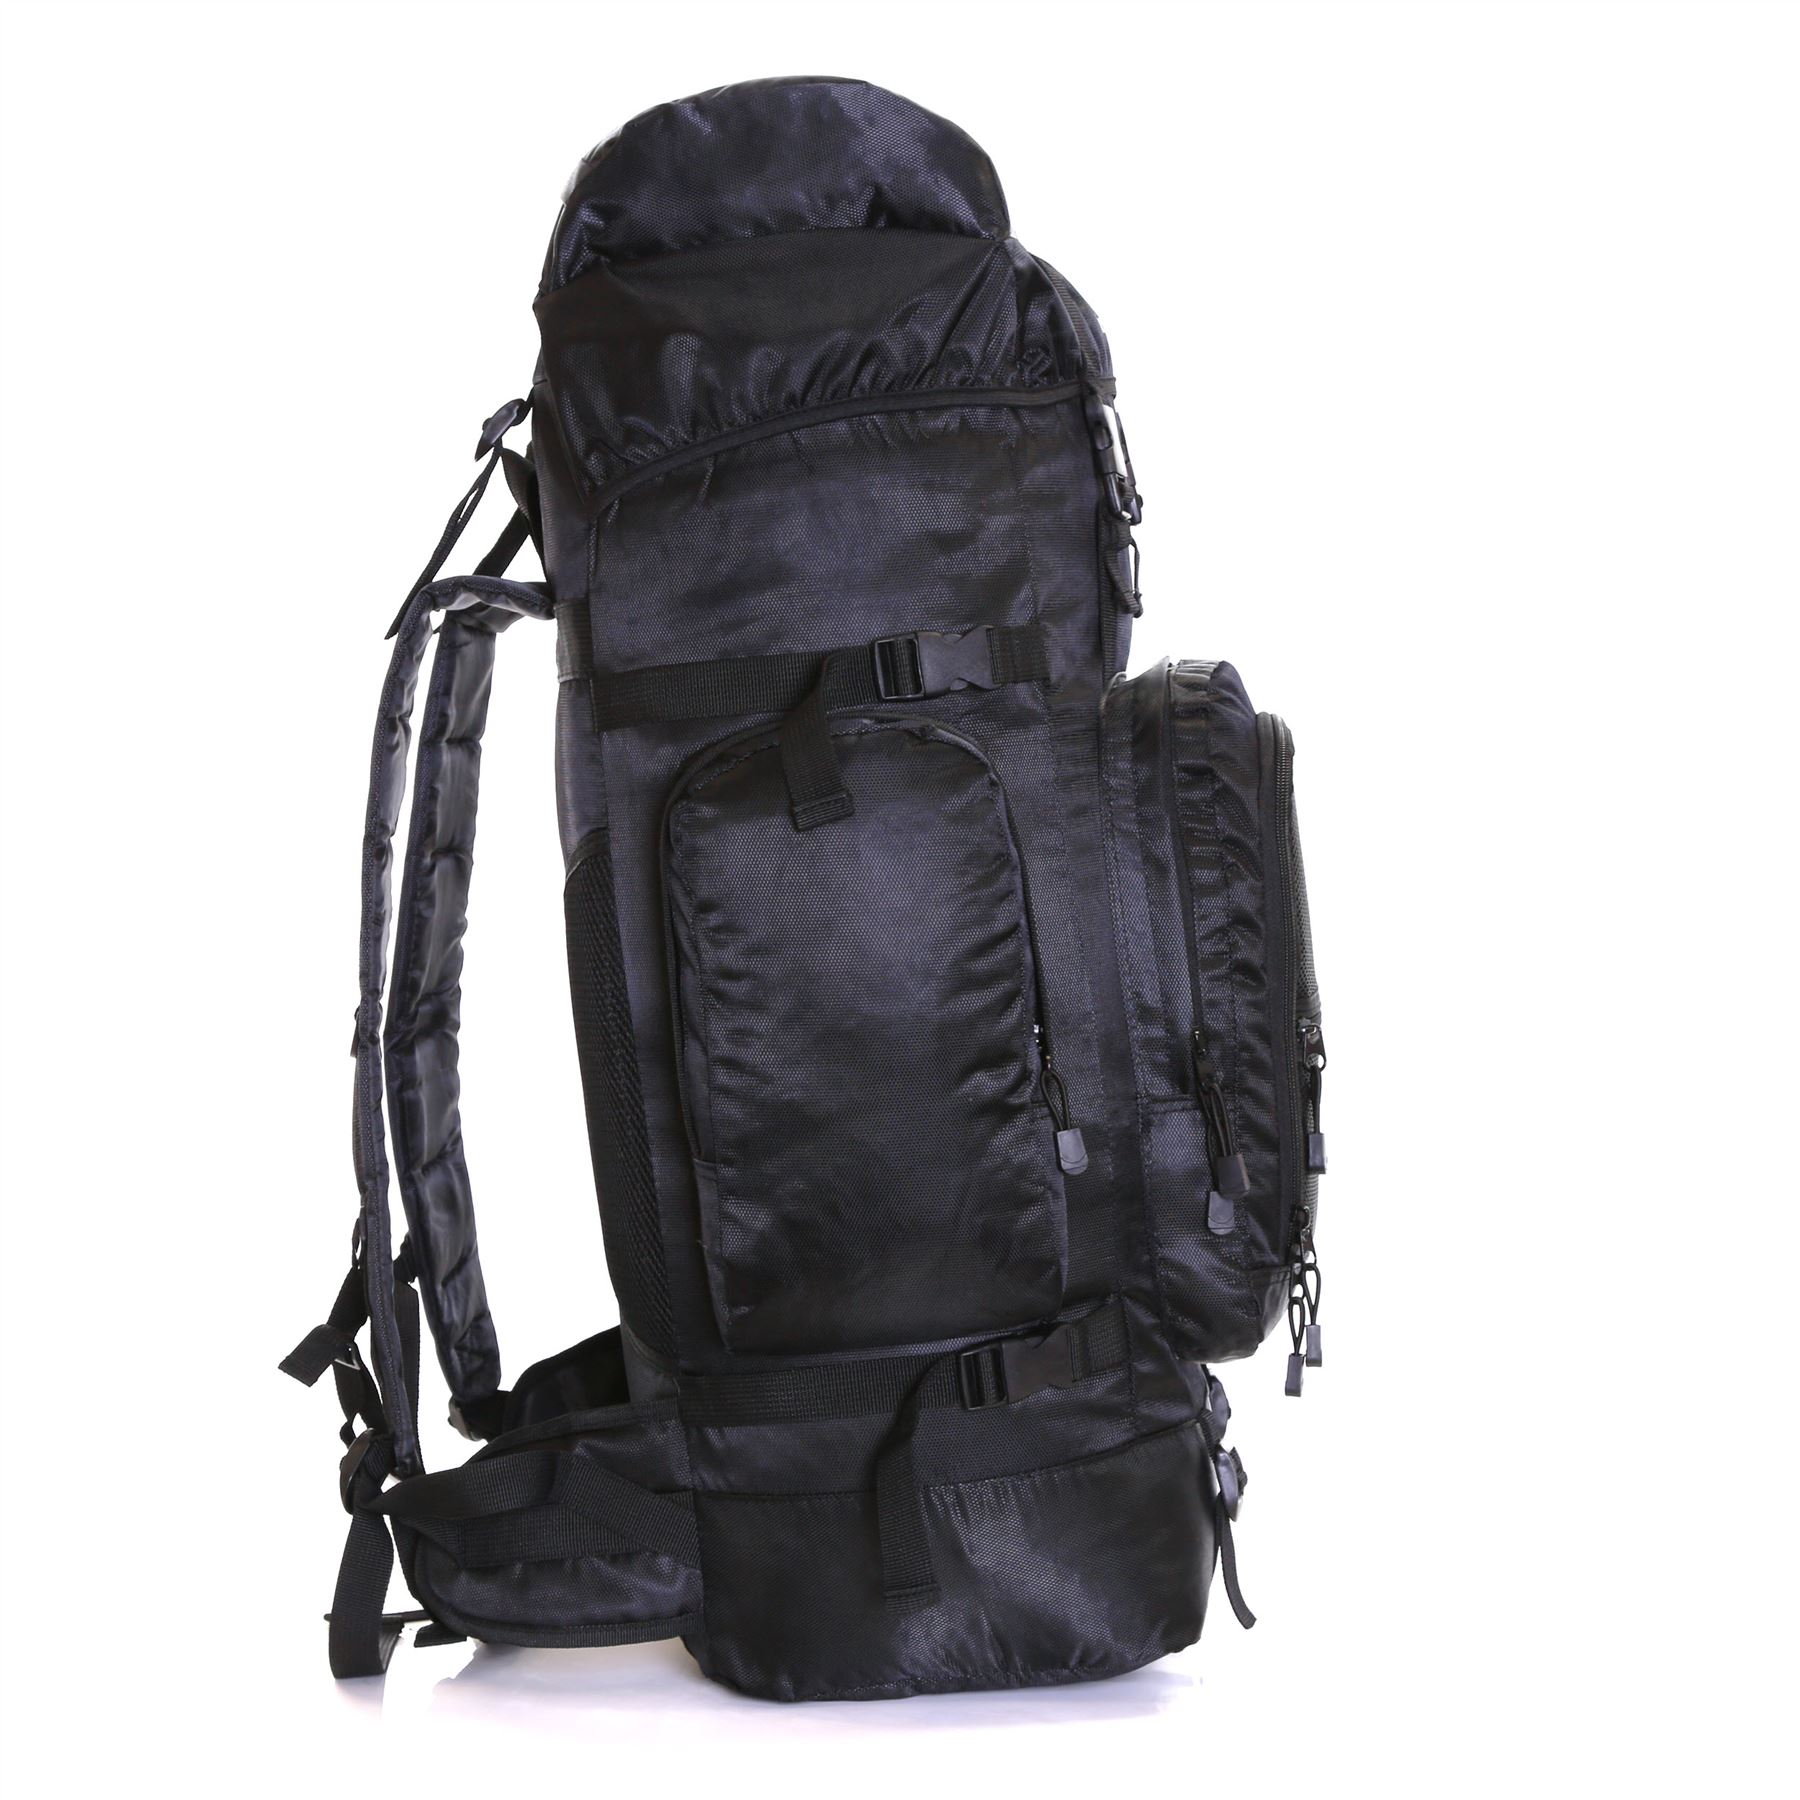 Extra Large 80L Travel Backpack Hiking//Camping Rucksack Luggage Bag UK